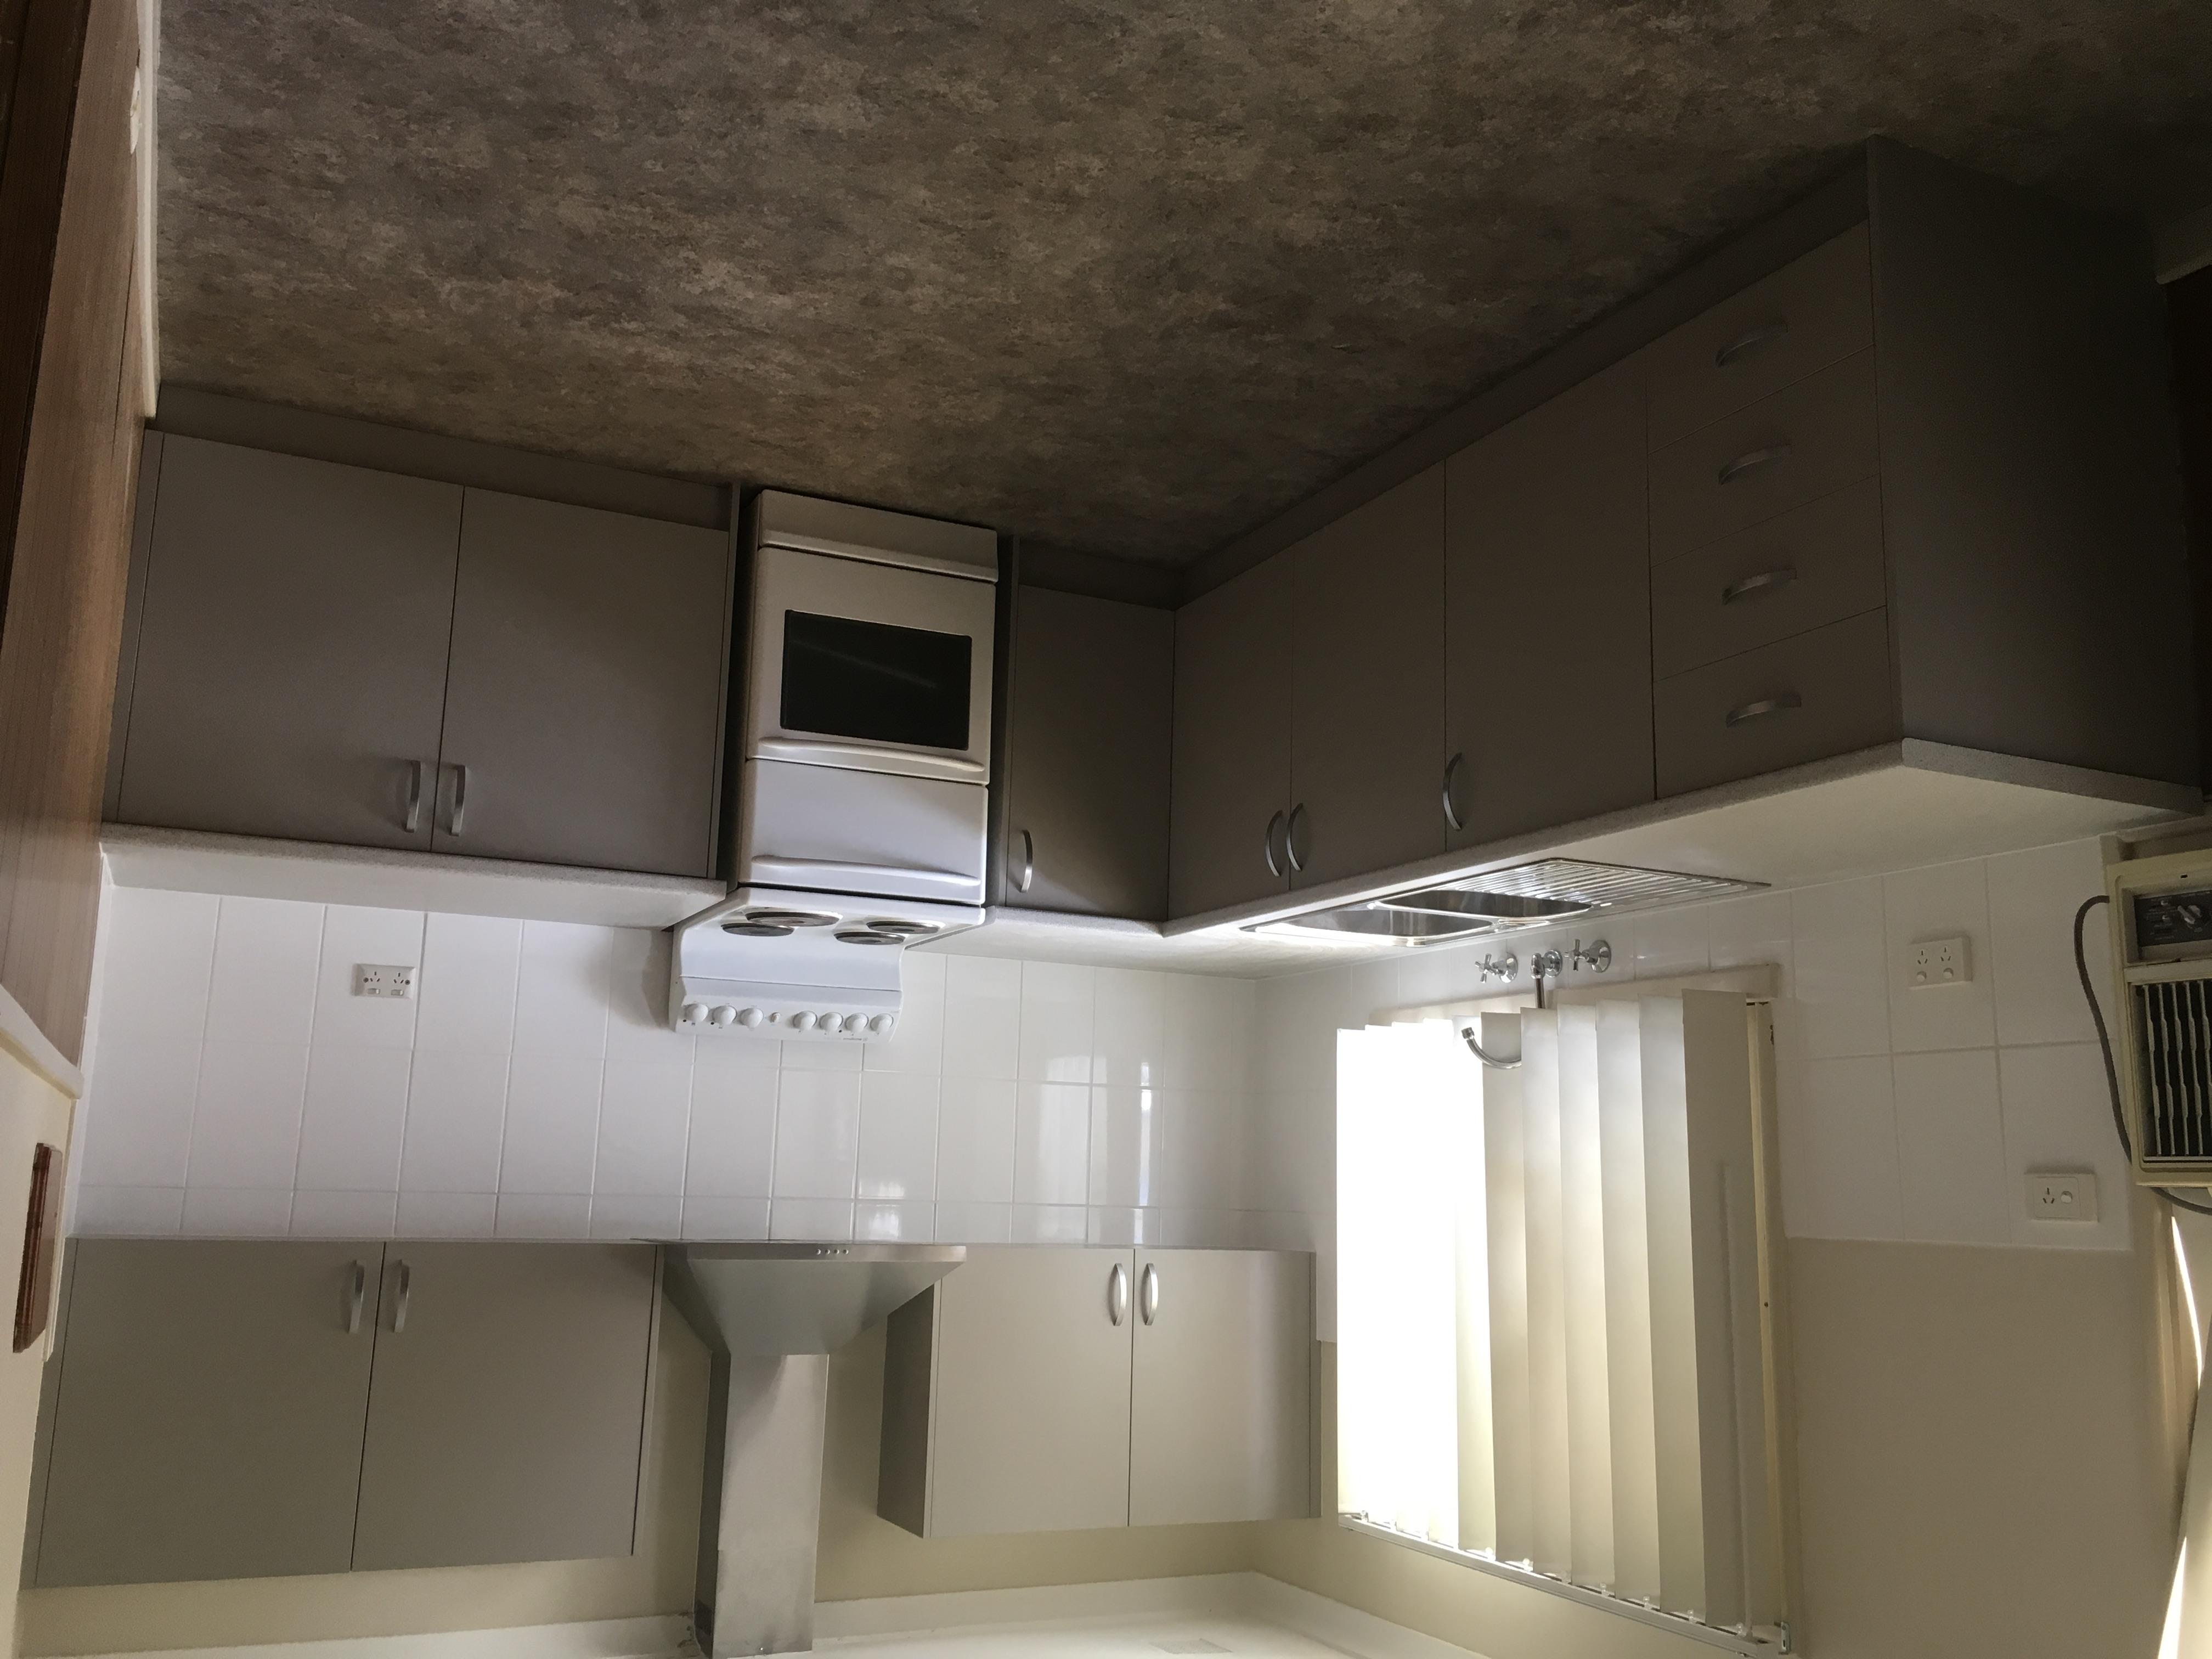 Kitchen renovation, cabinetry